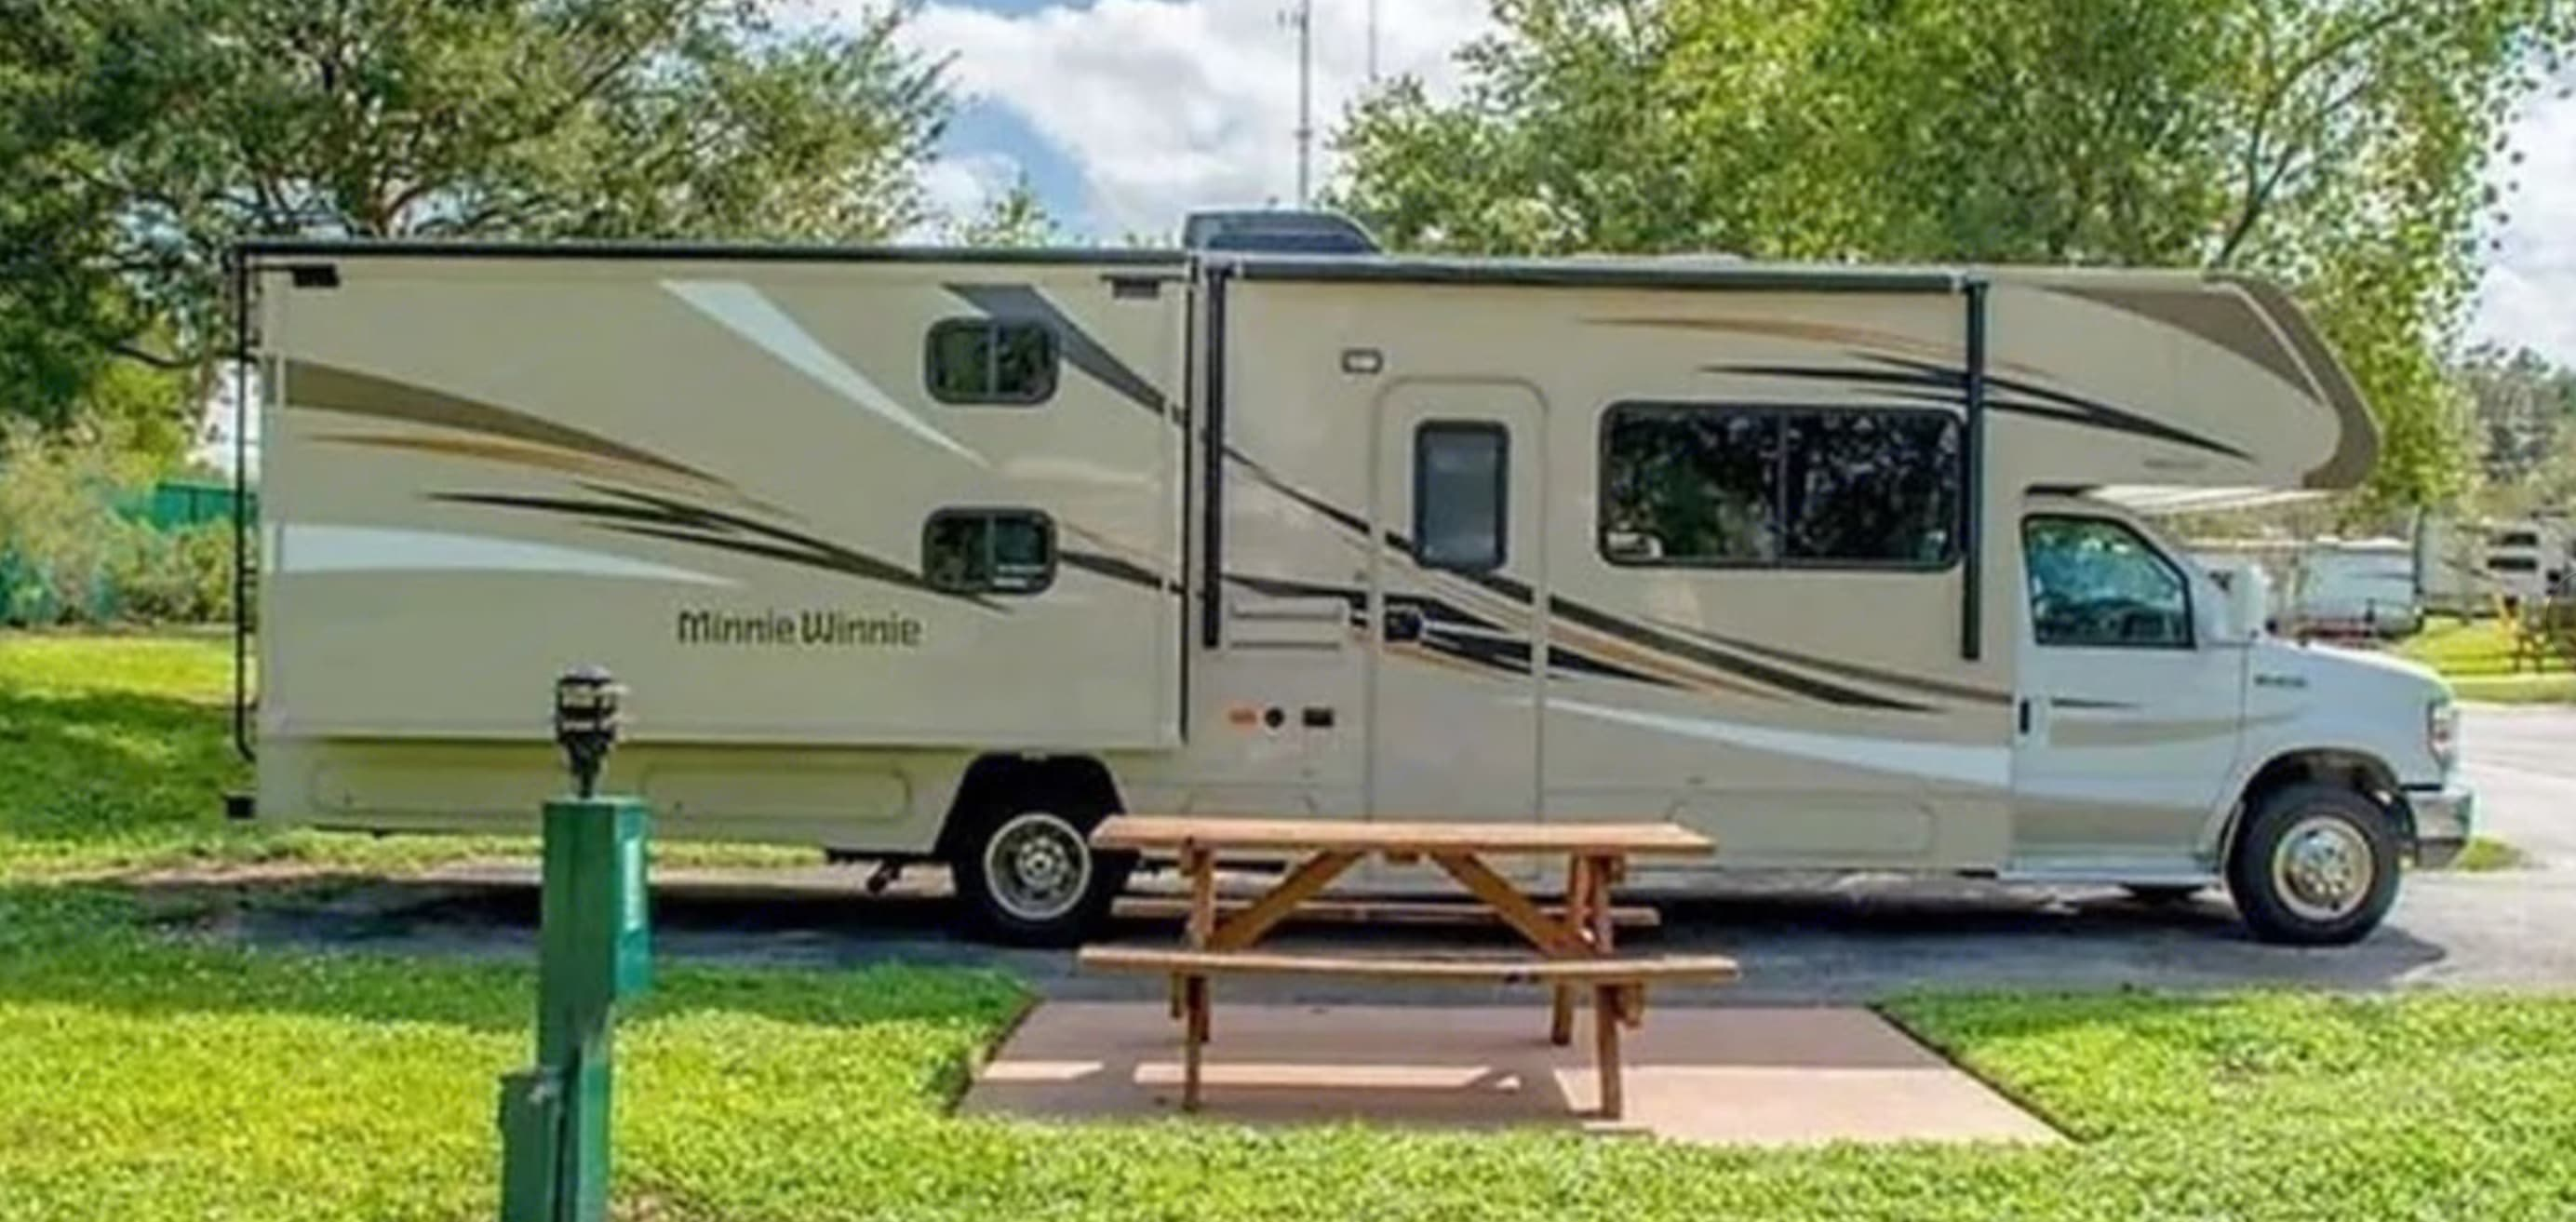 Camping 33 Minnie Winnie. Winnebago Catalina Premier Series 331H 2015